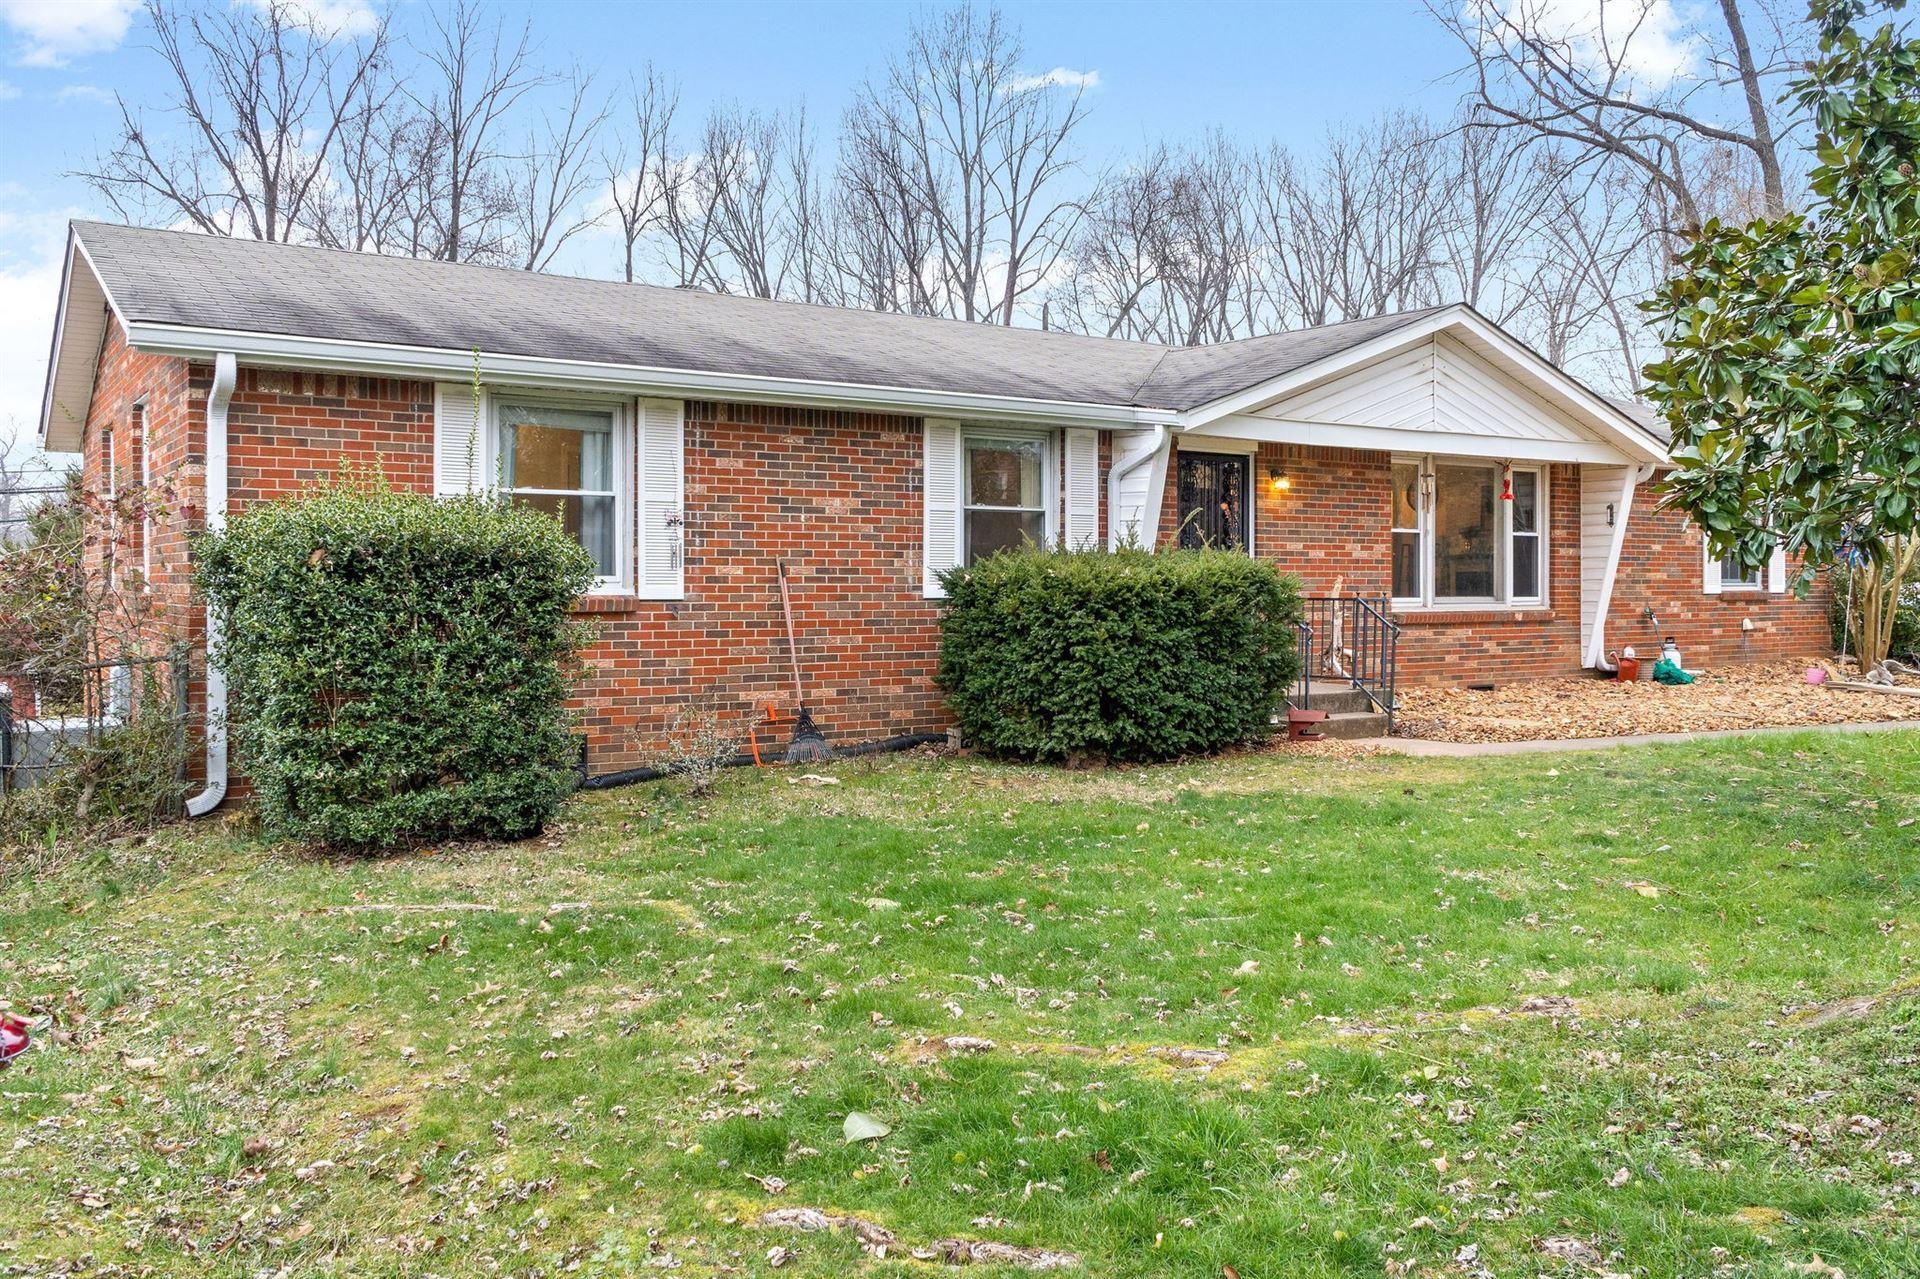 213 Mills Dr, Clarksville, TN 37042 - MLS#: 2220397